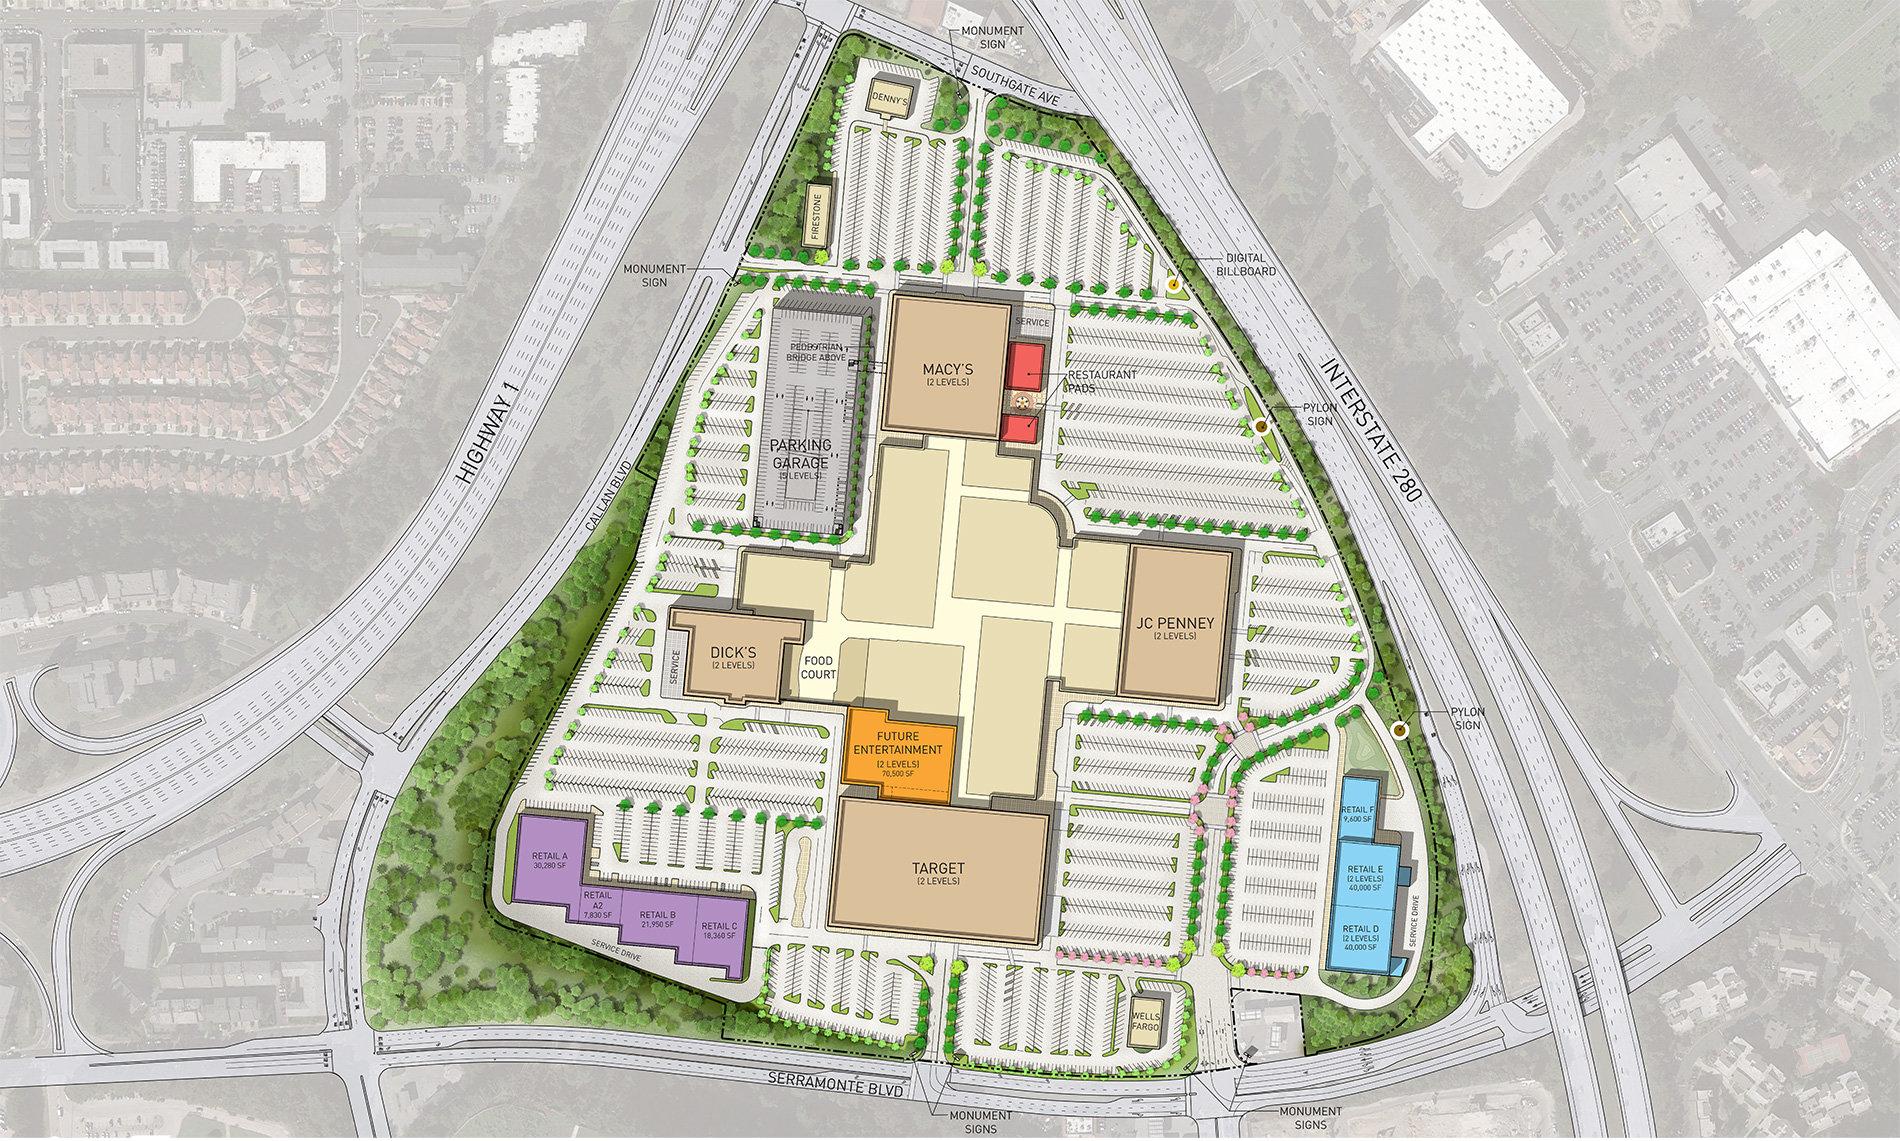 150501 serramonte site plan 24x36